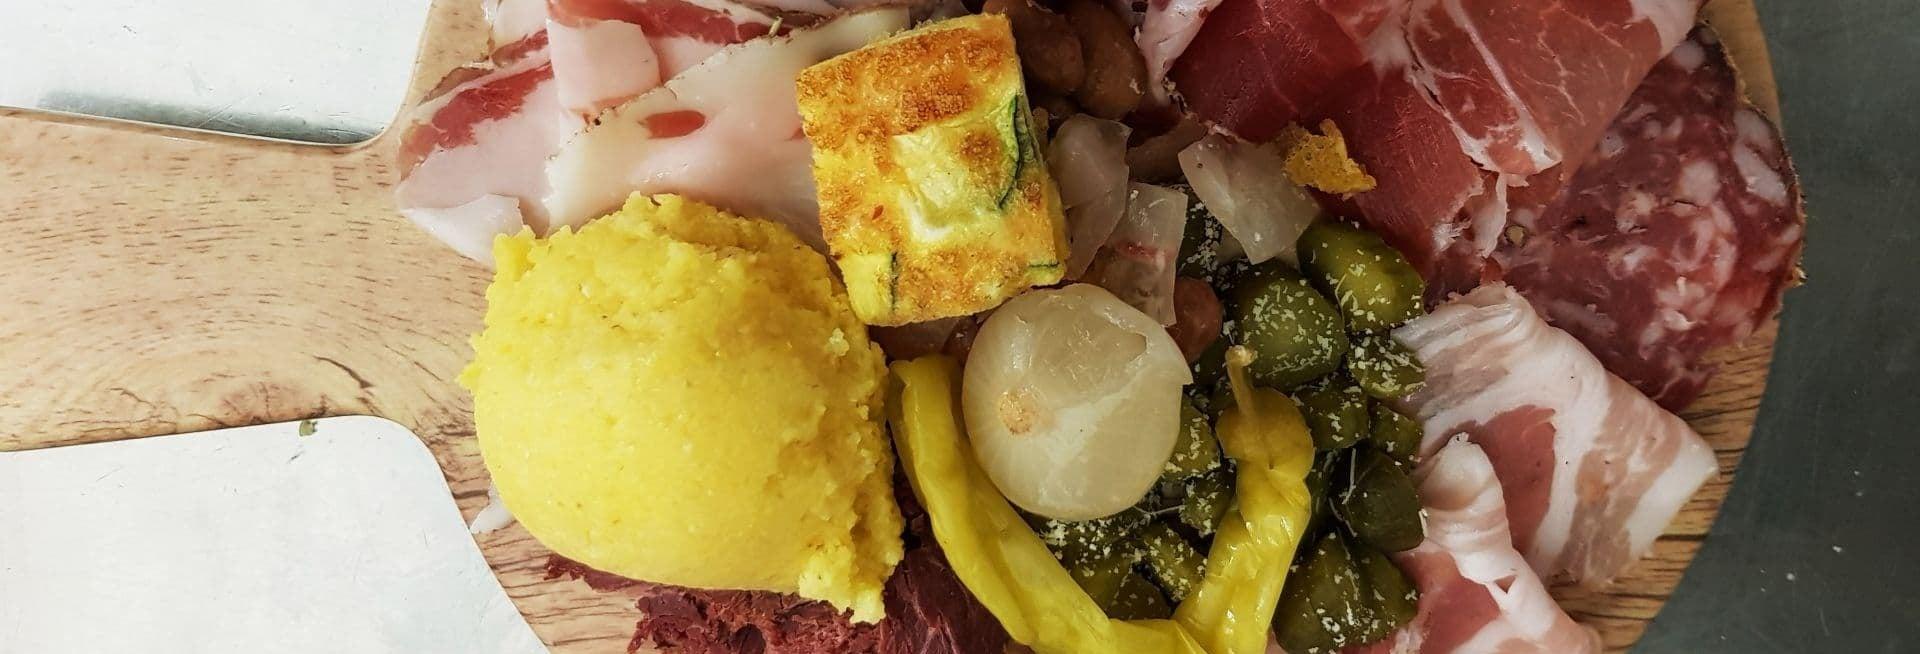 Visite gastronomique de Bergame